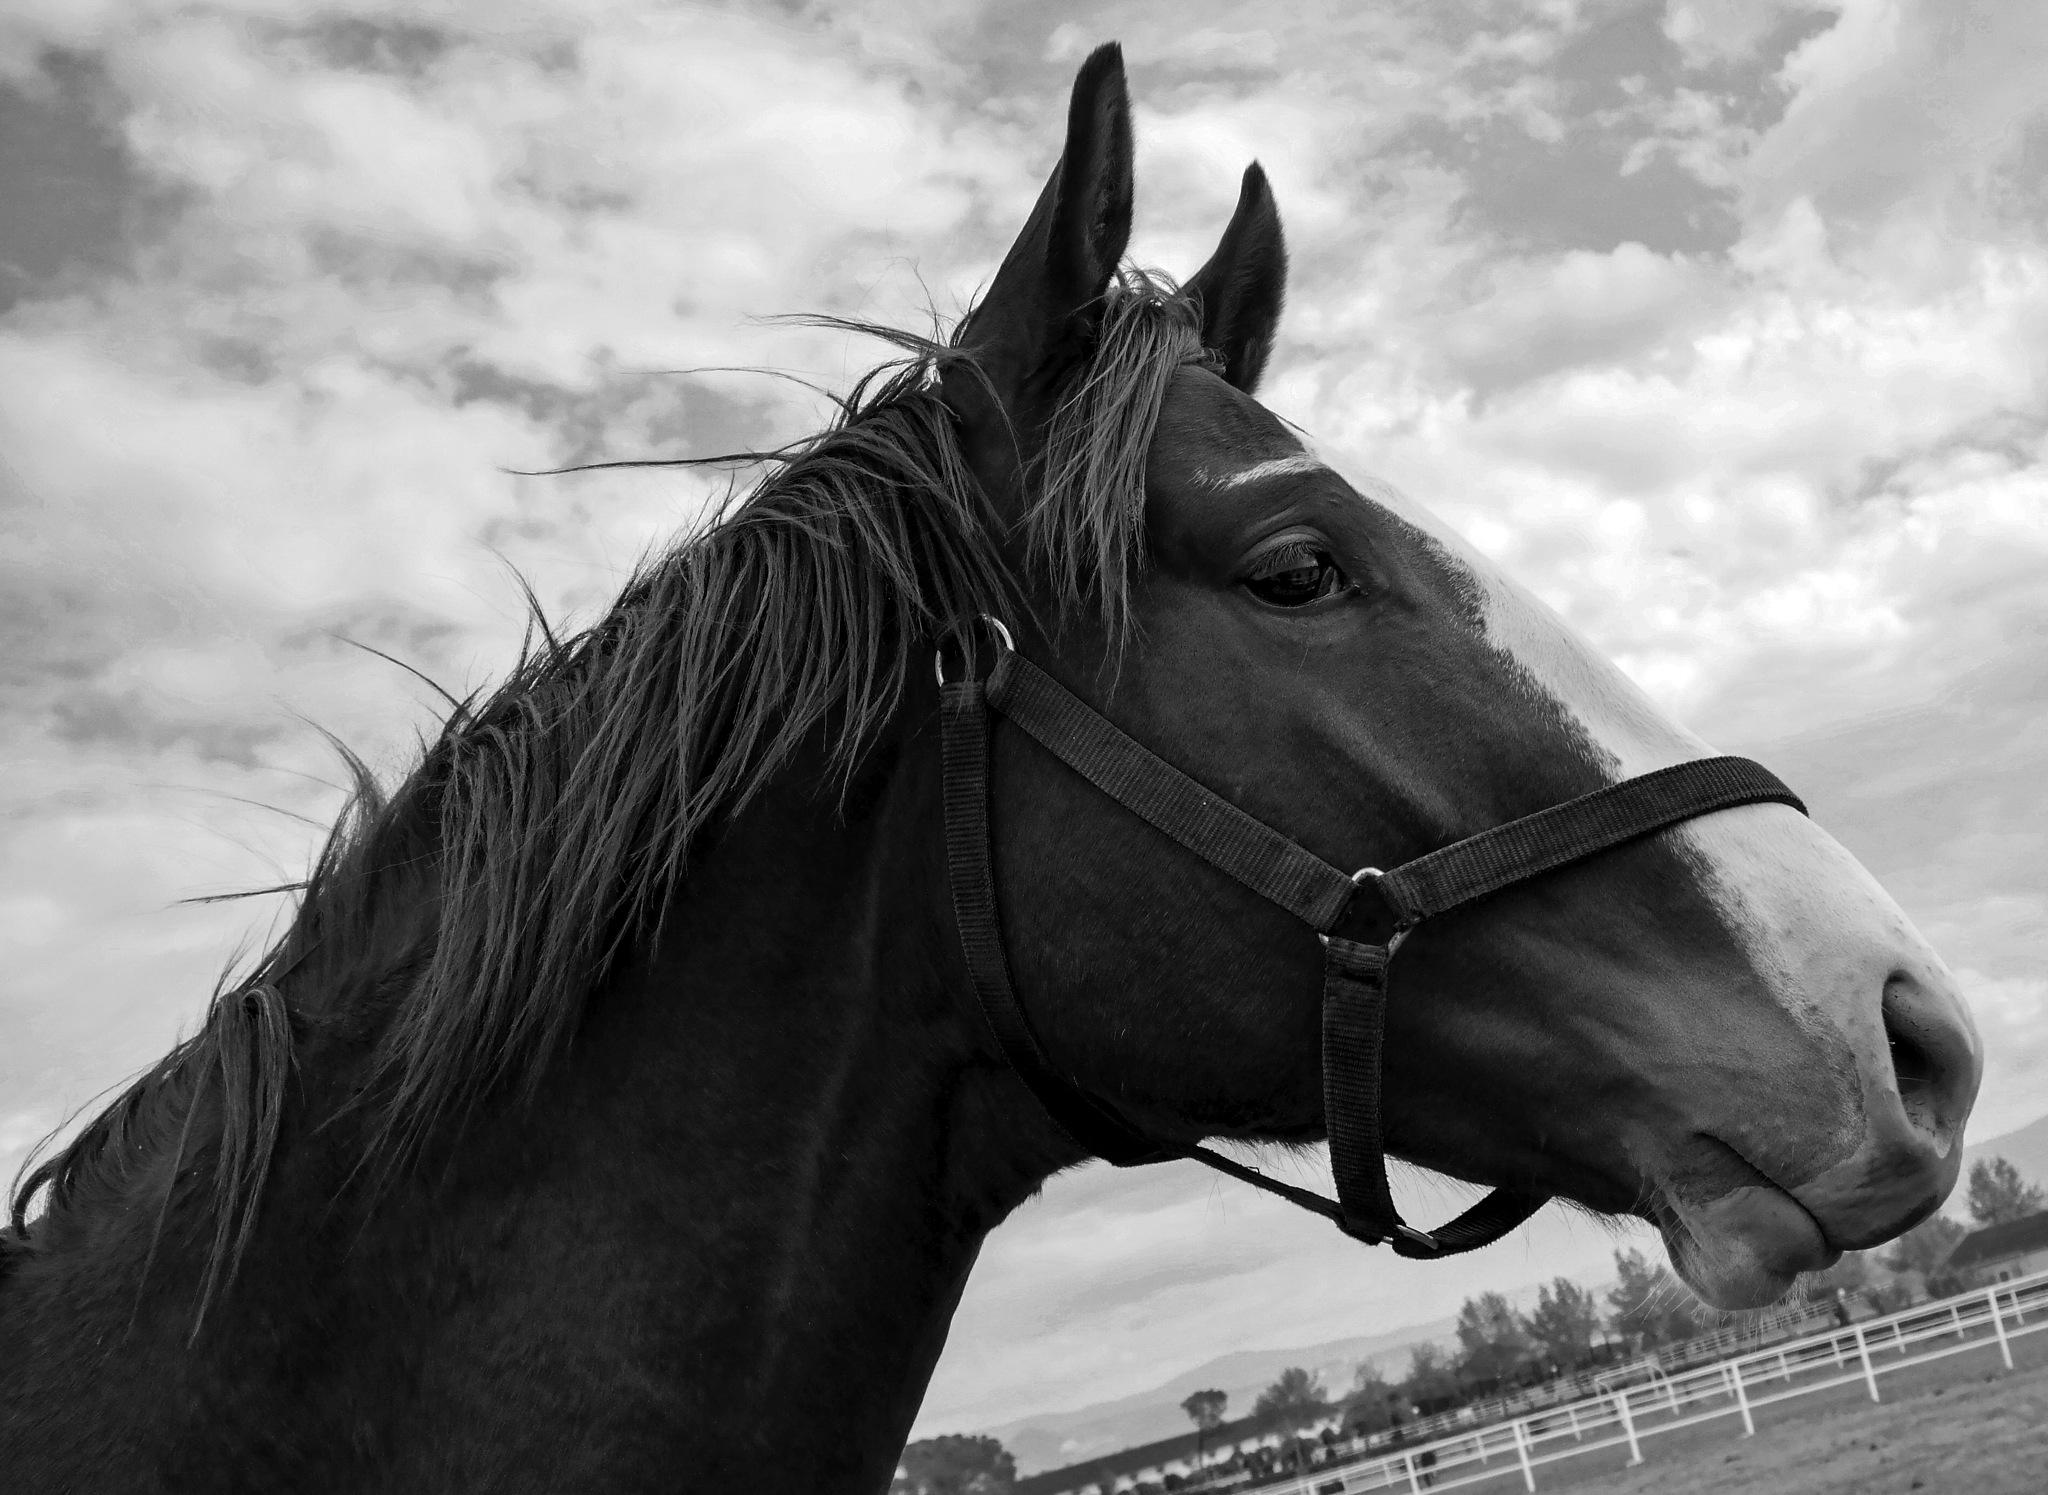 horse portrait-b&w version by Muhsin Özcan